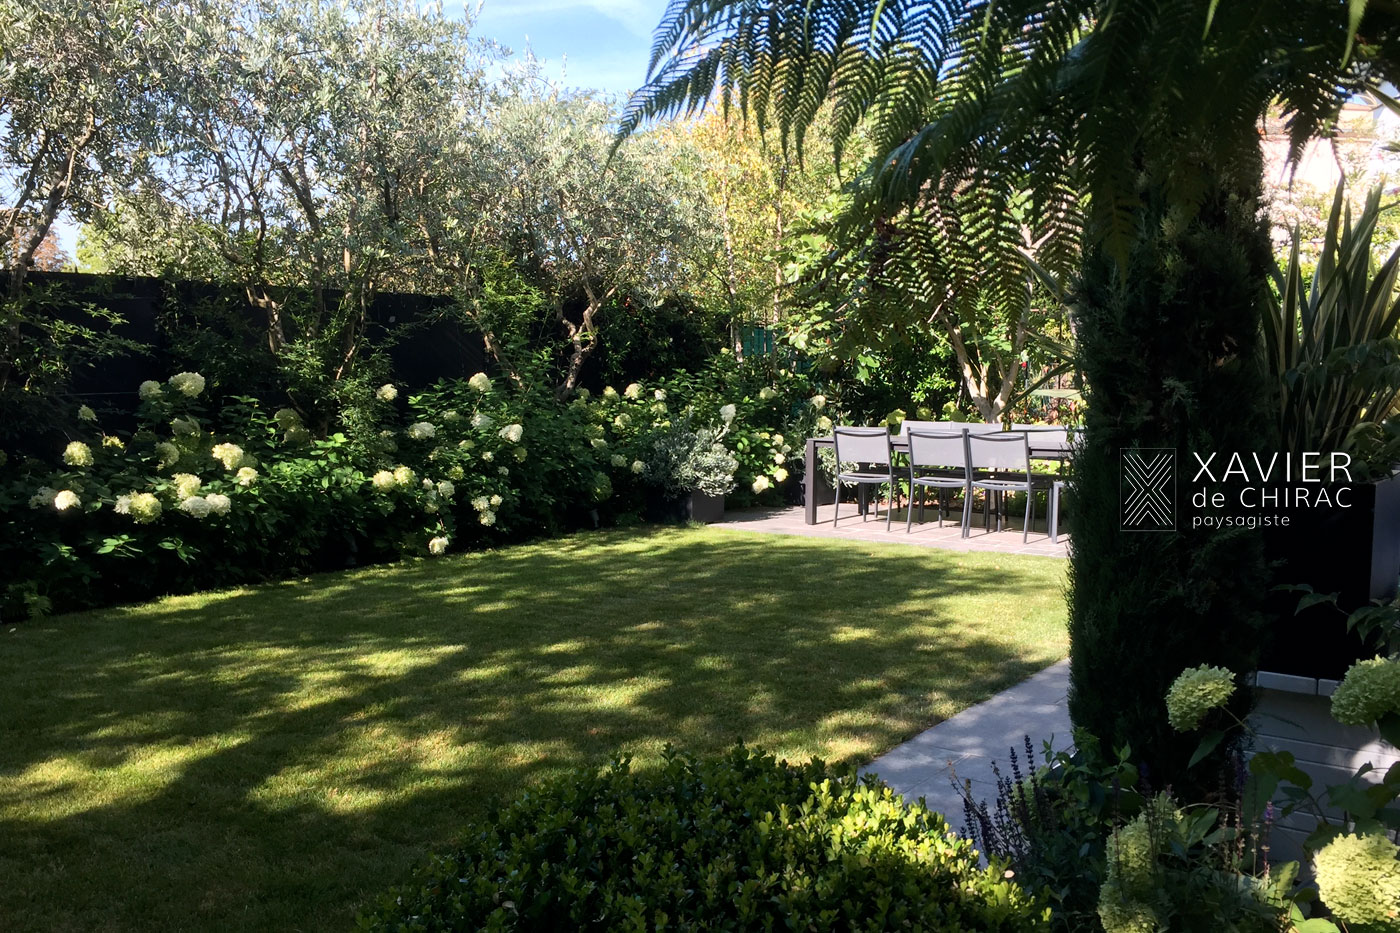 jardin urbain de style anglais xavier de chirac paysagiste